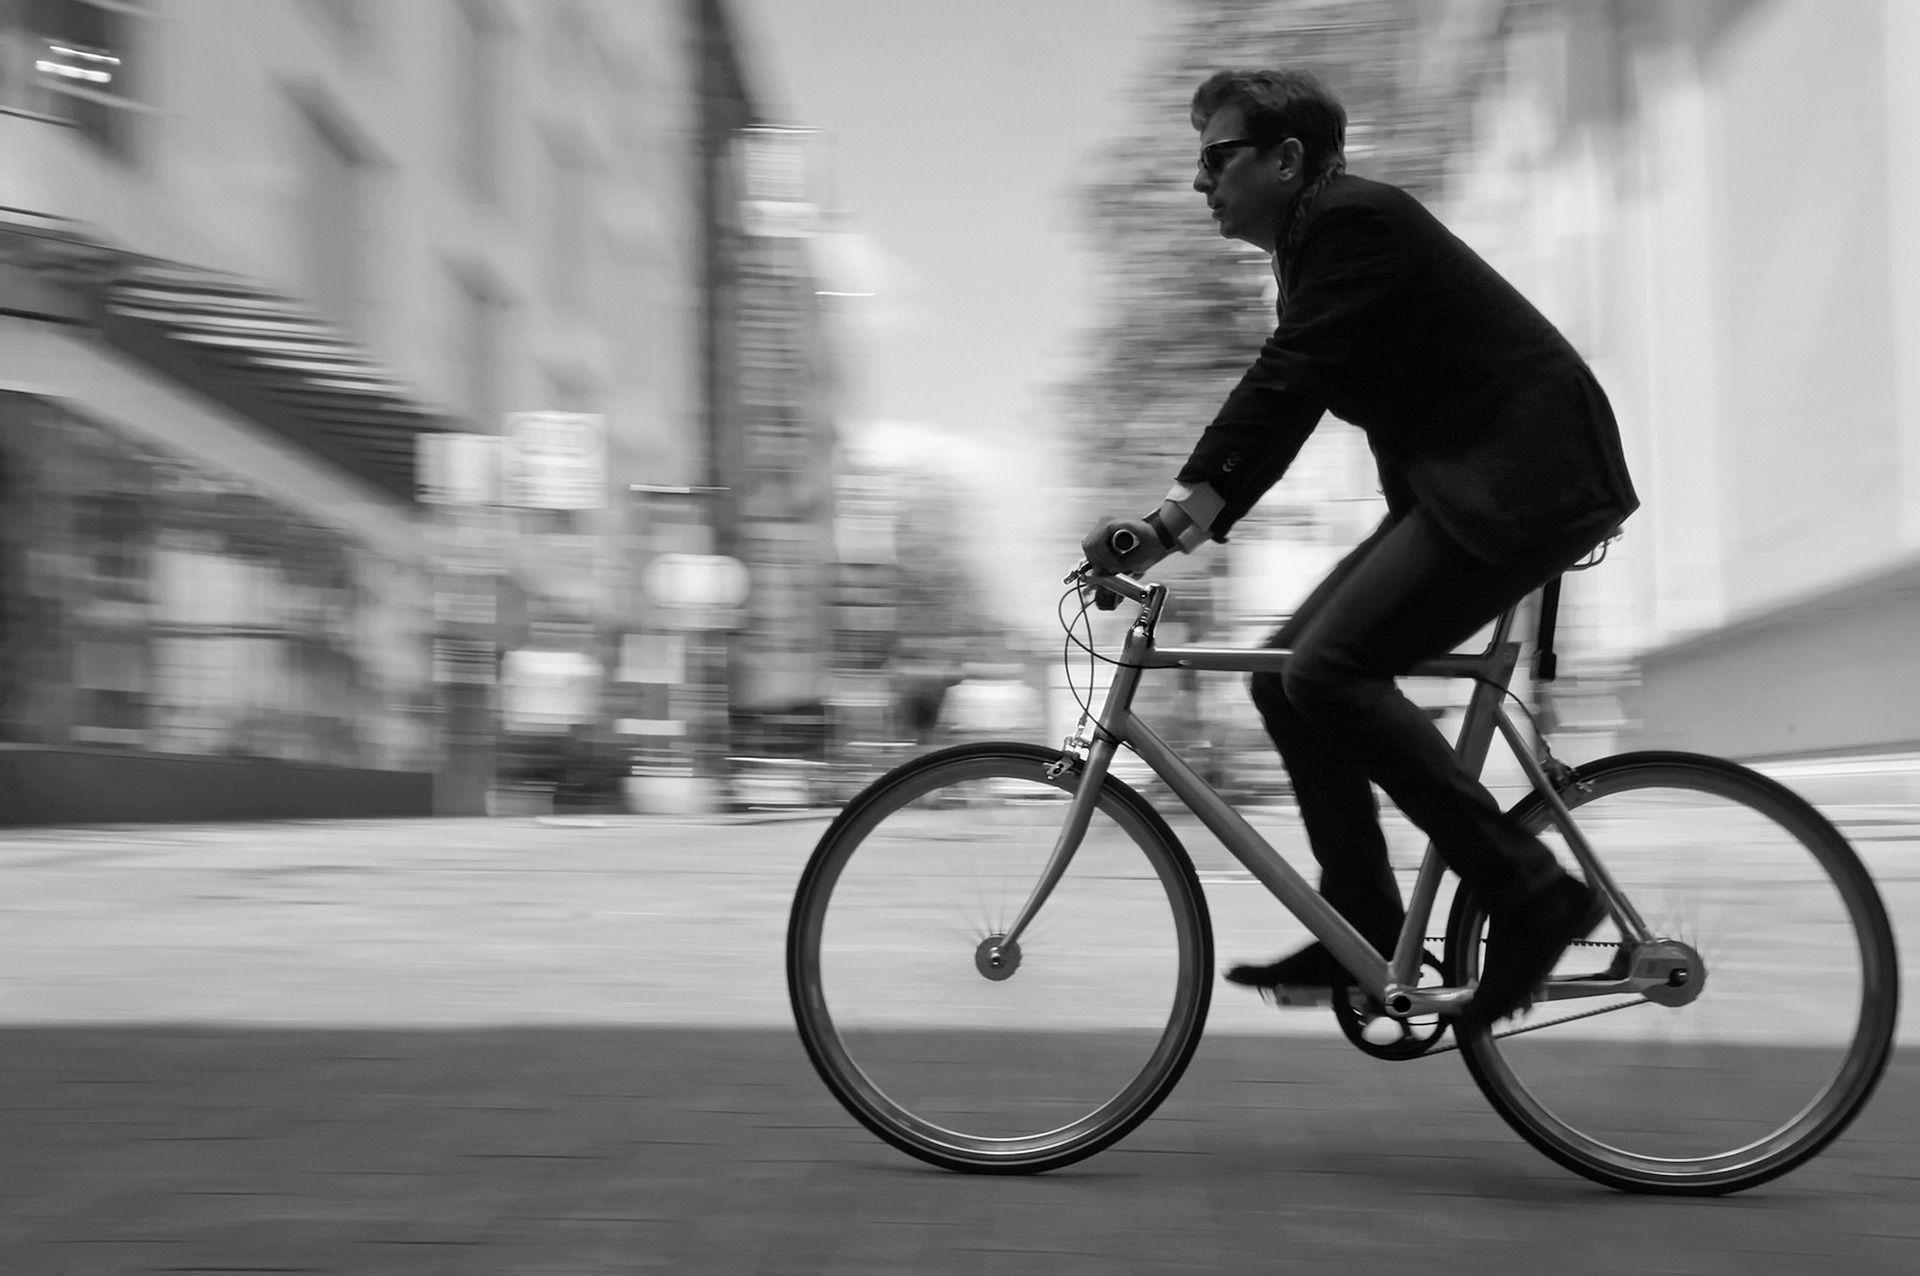 Stadt Kiel fördert Fahrradkauf ihrer Angestellten